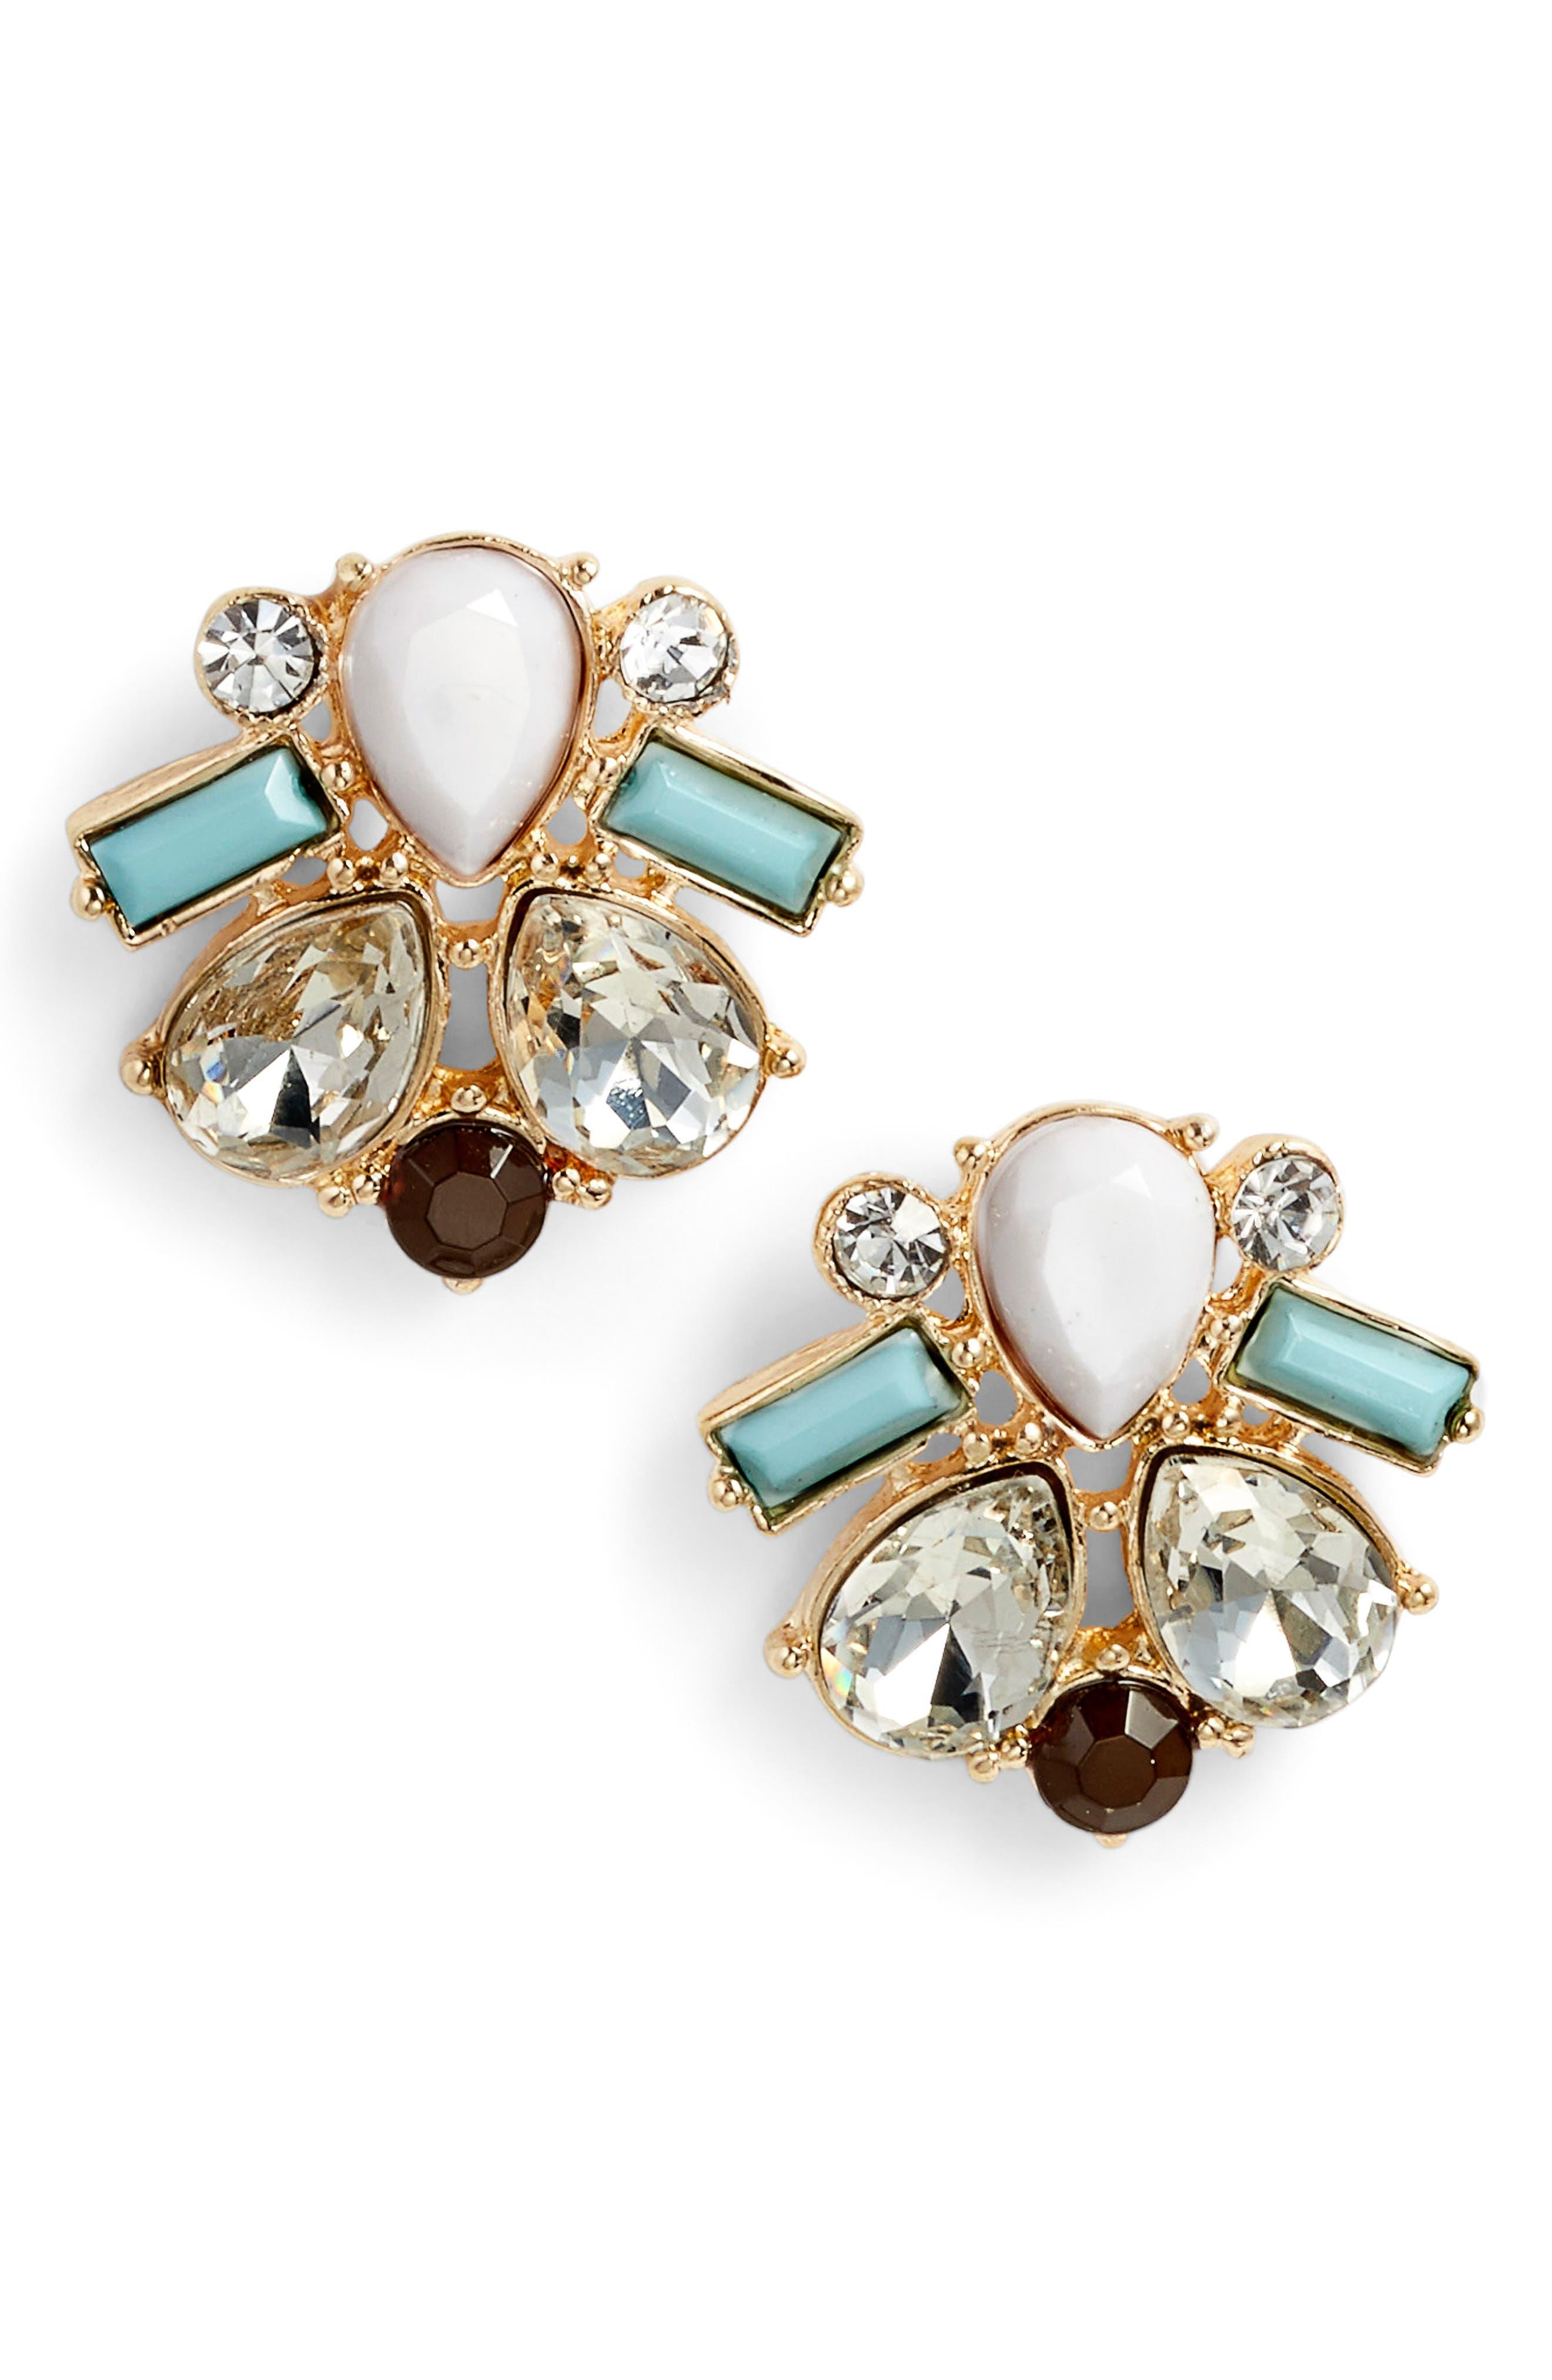 Crystal & Stone Stud Earrings,                             Main thumbnail 1, color,                             White/ Mint/ Gold